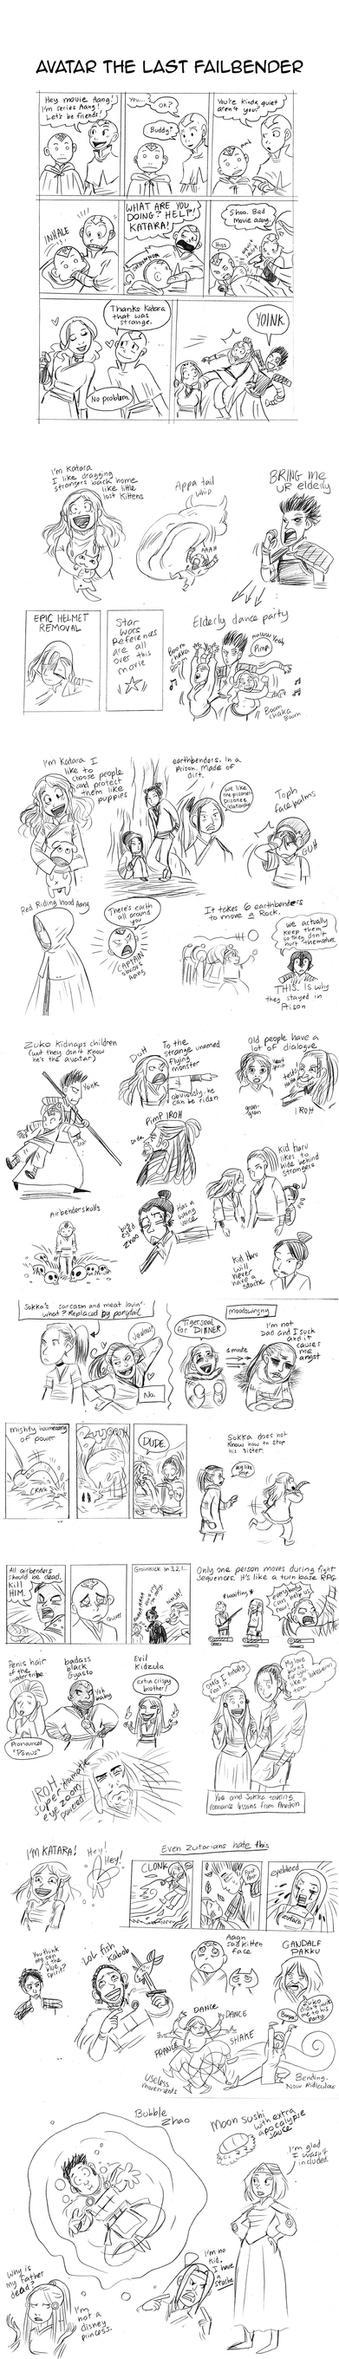 Airbender Movie Sketches by secondlina